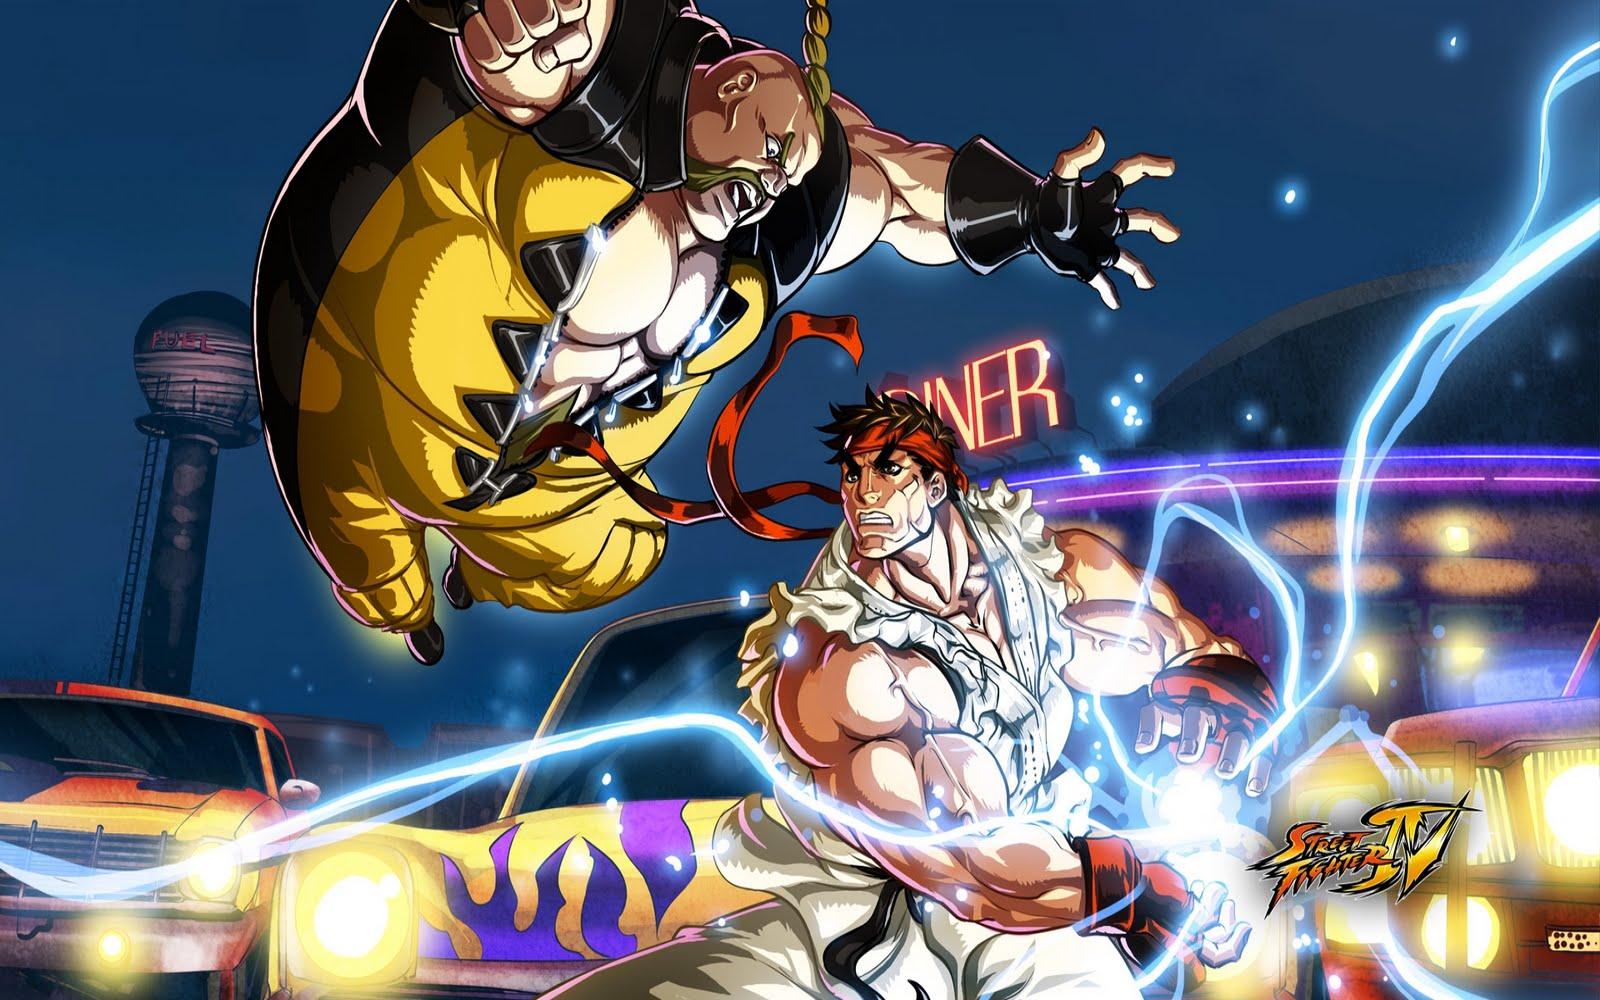 Street Fighter 5 Wallpaper: Street Fighter IV Wallpapers